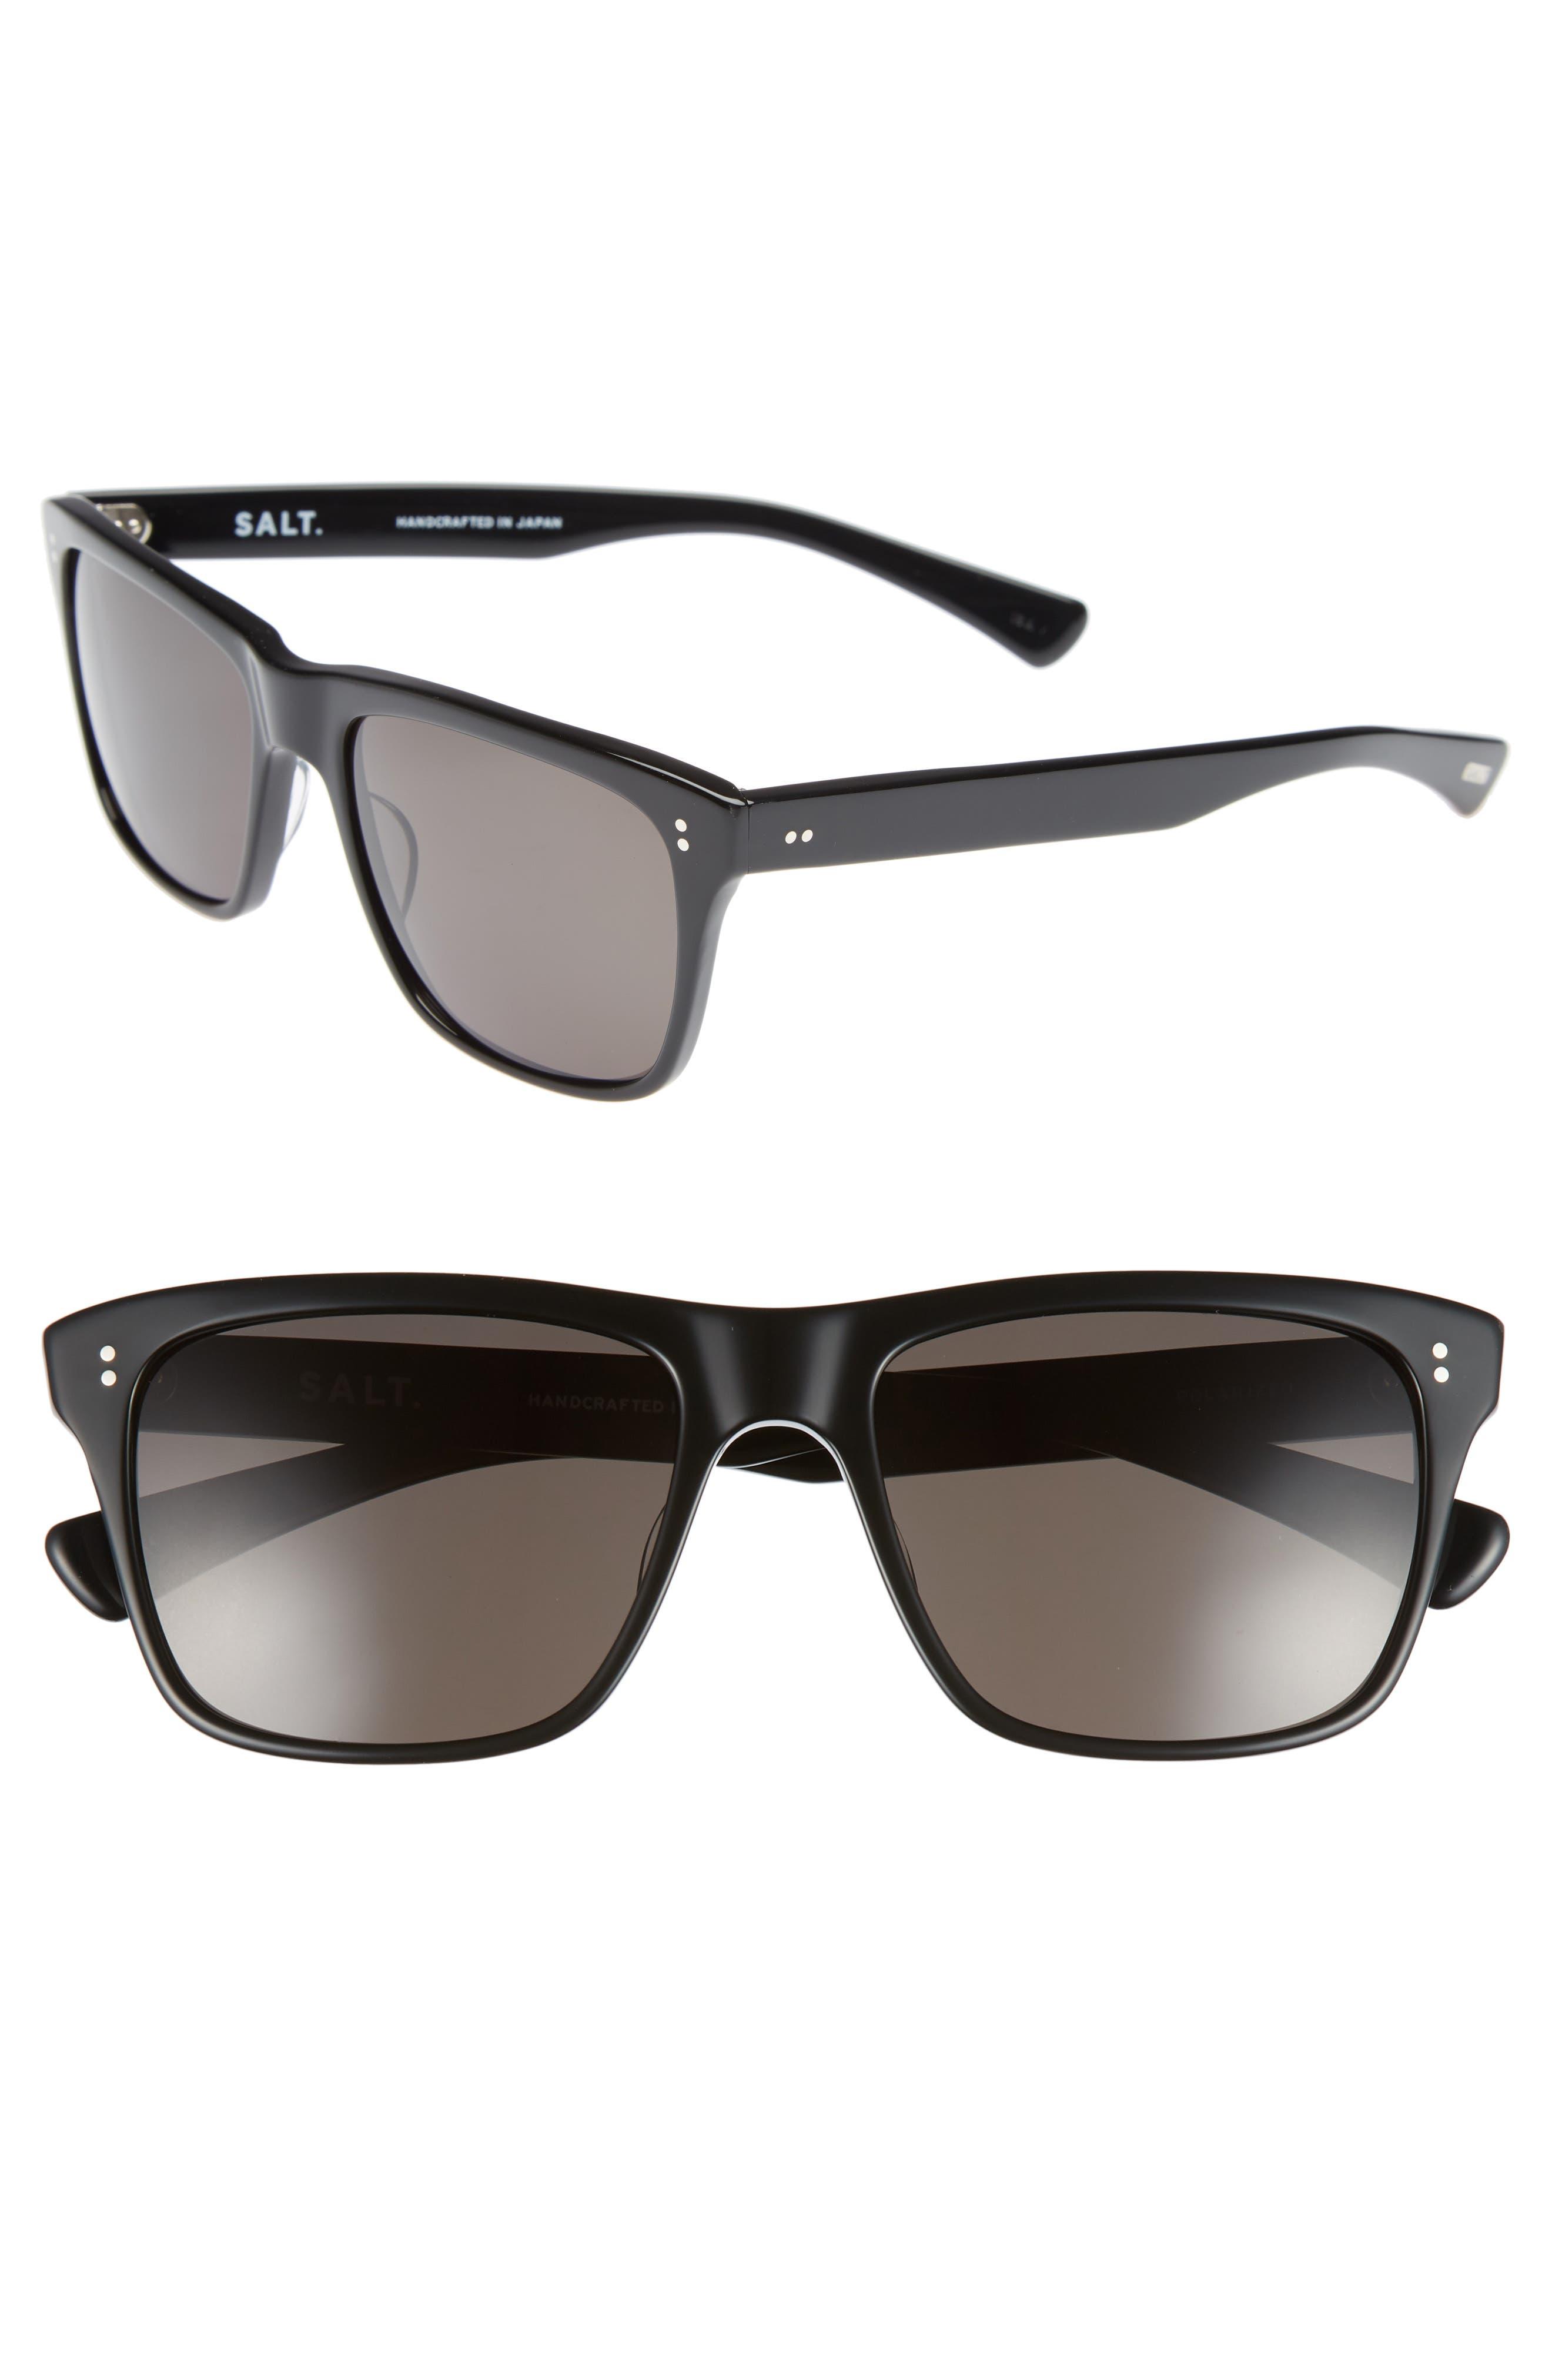 Elihu 57mm Polarized Sunglasses,                             Main thumbnail 1, color,                             BLACK